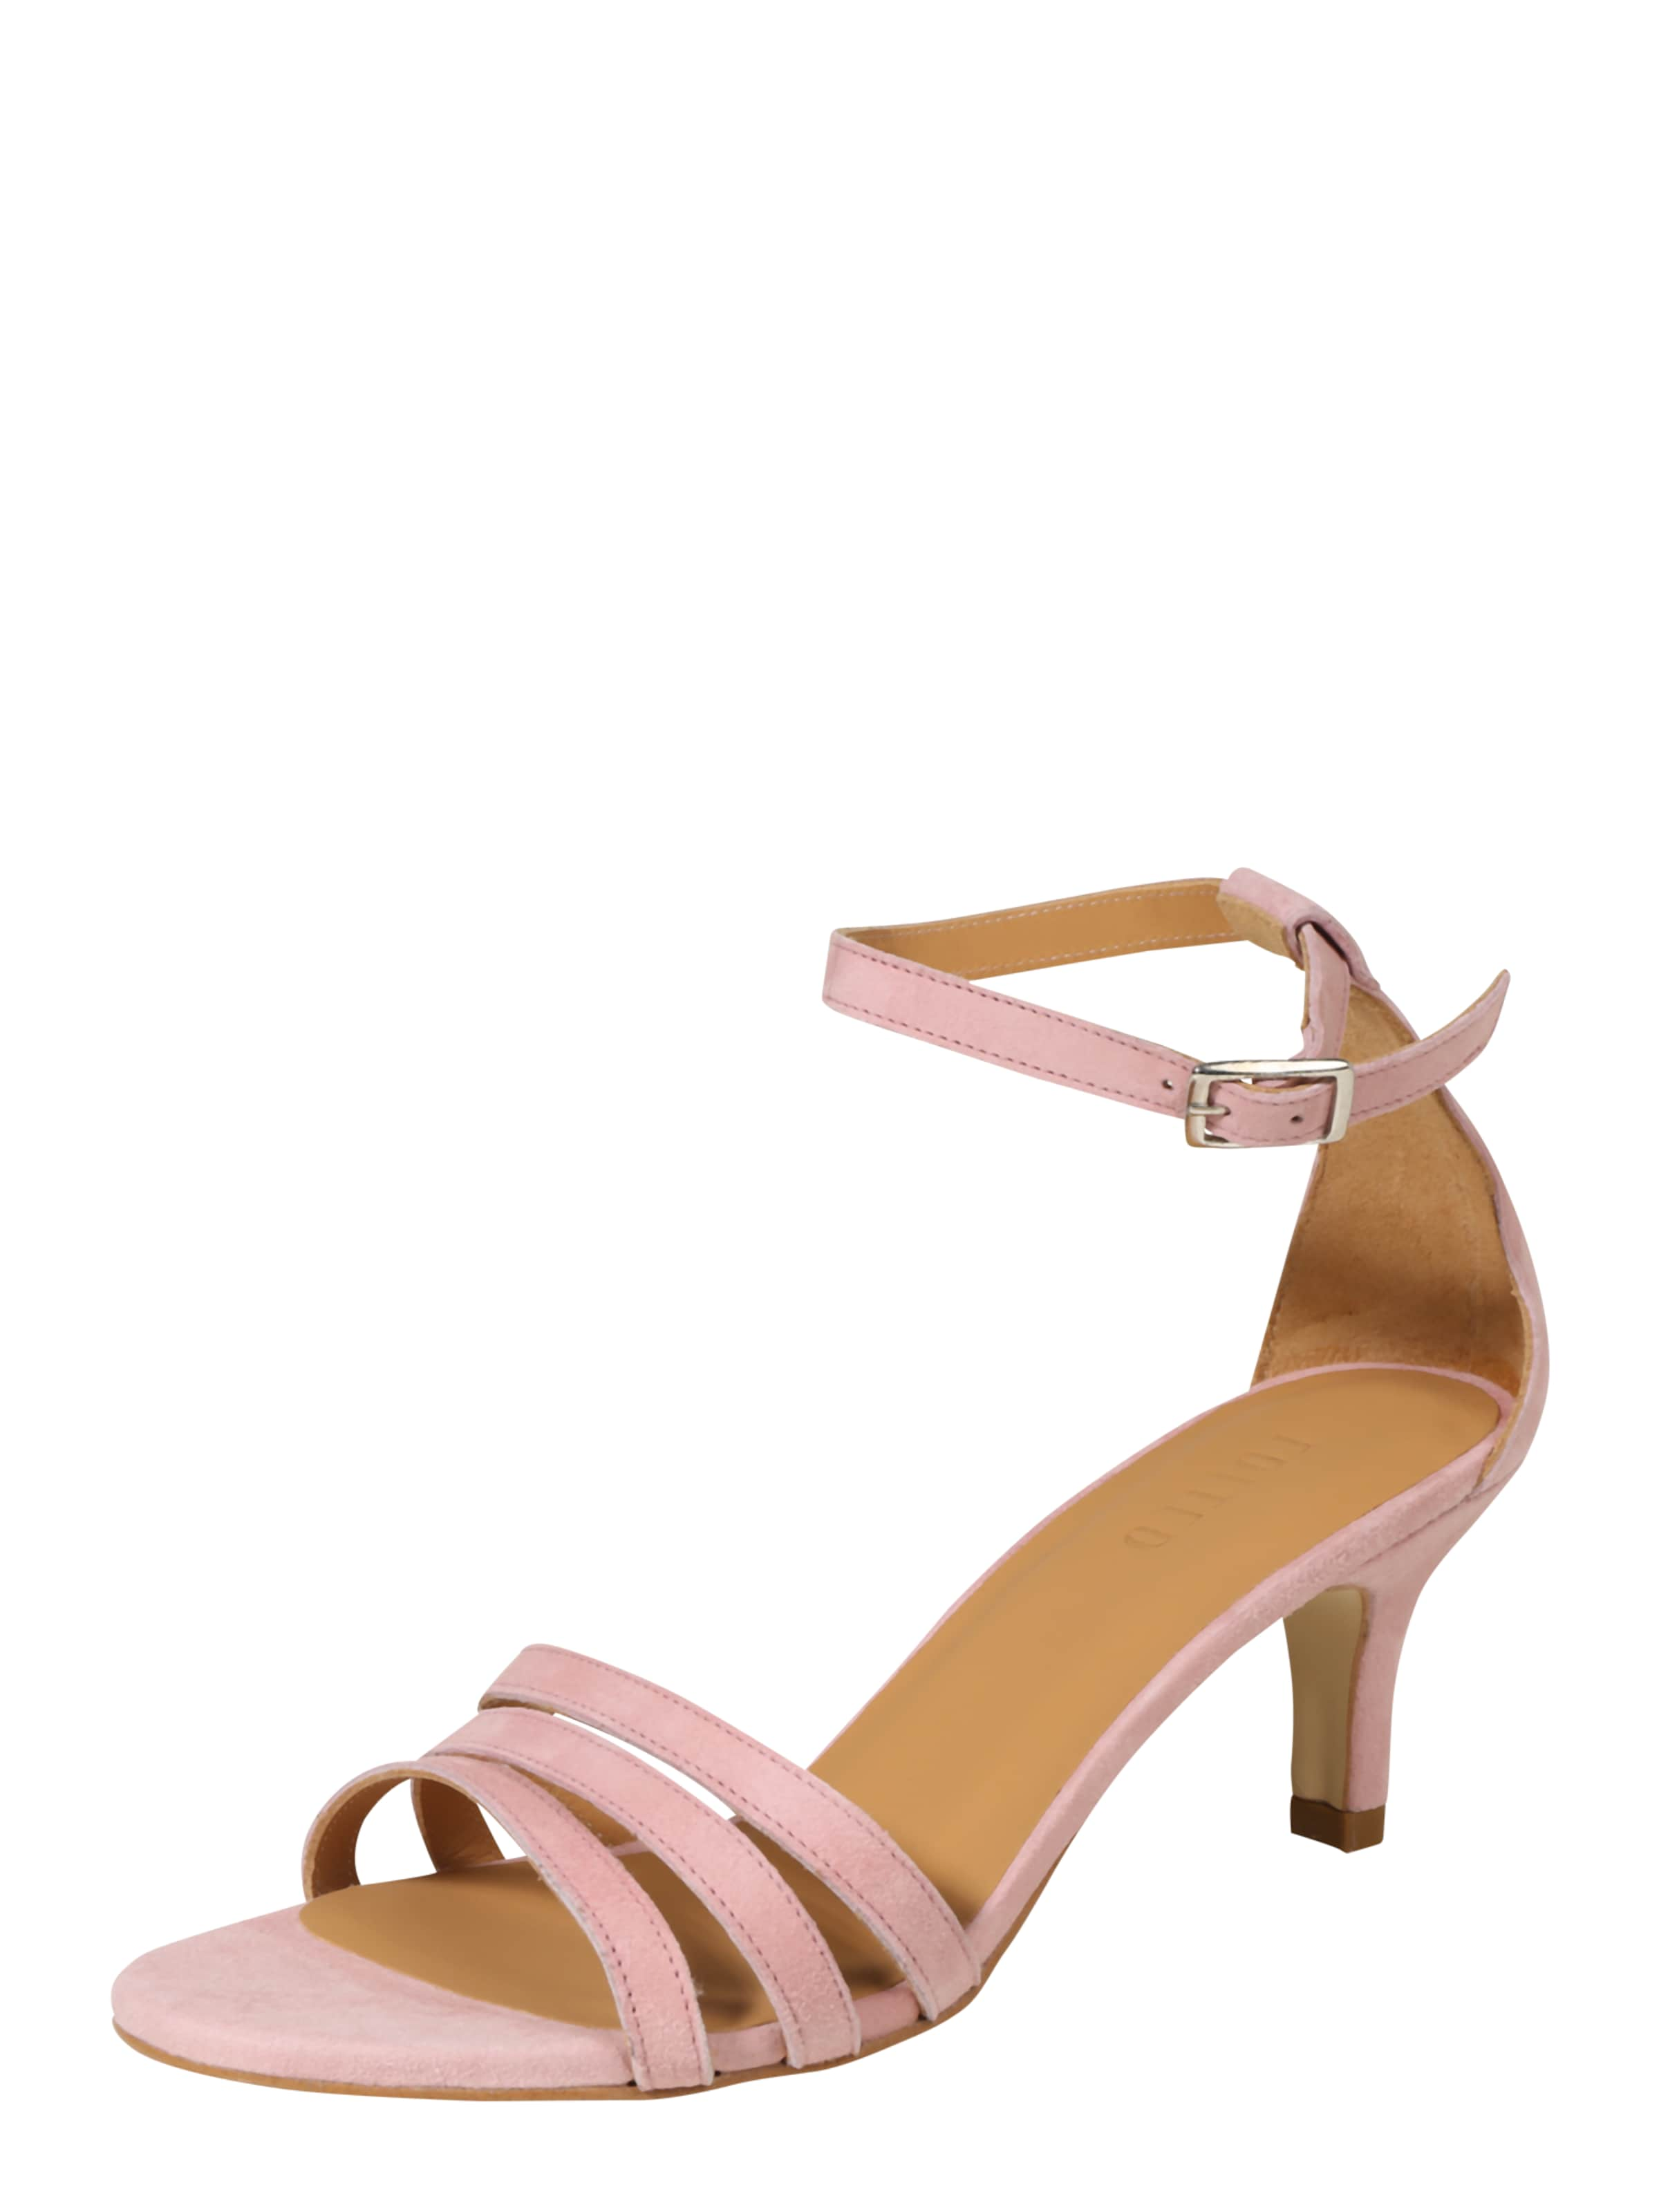 EDITED Sandalette Amela Verschleißfeste billige Schuhe